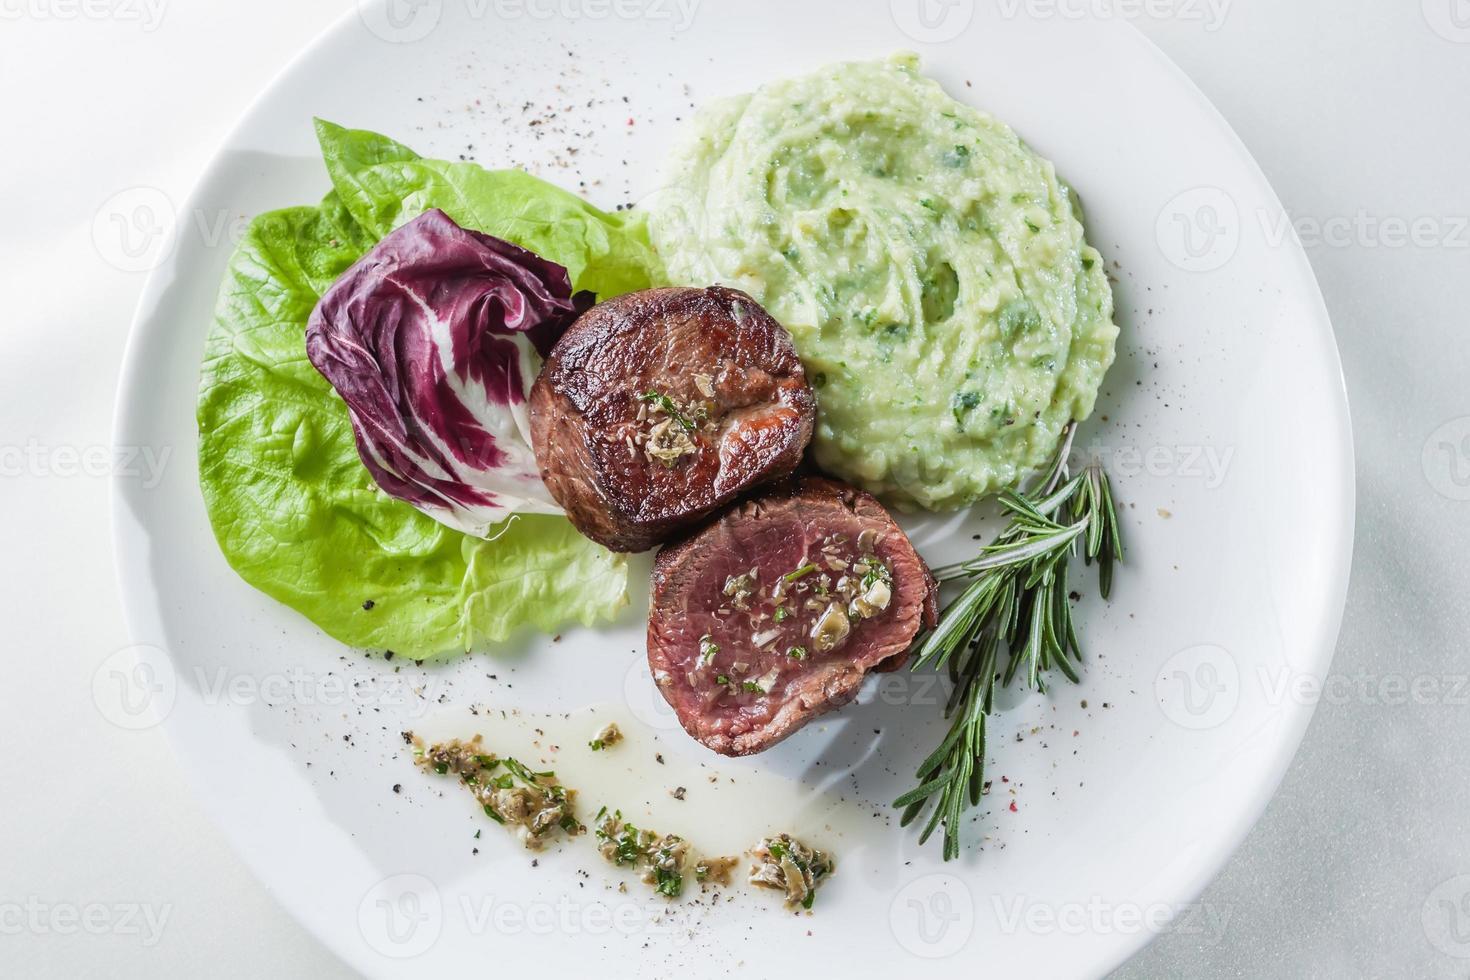 roast steak with lettuce, rosemary and mashed potatoes photo